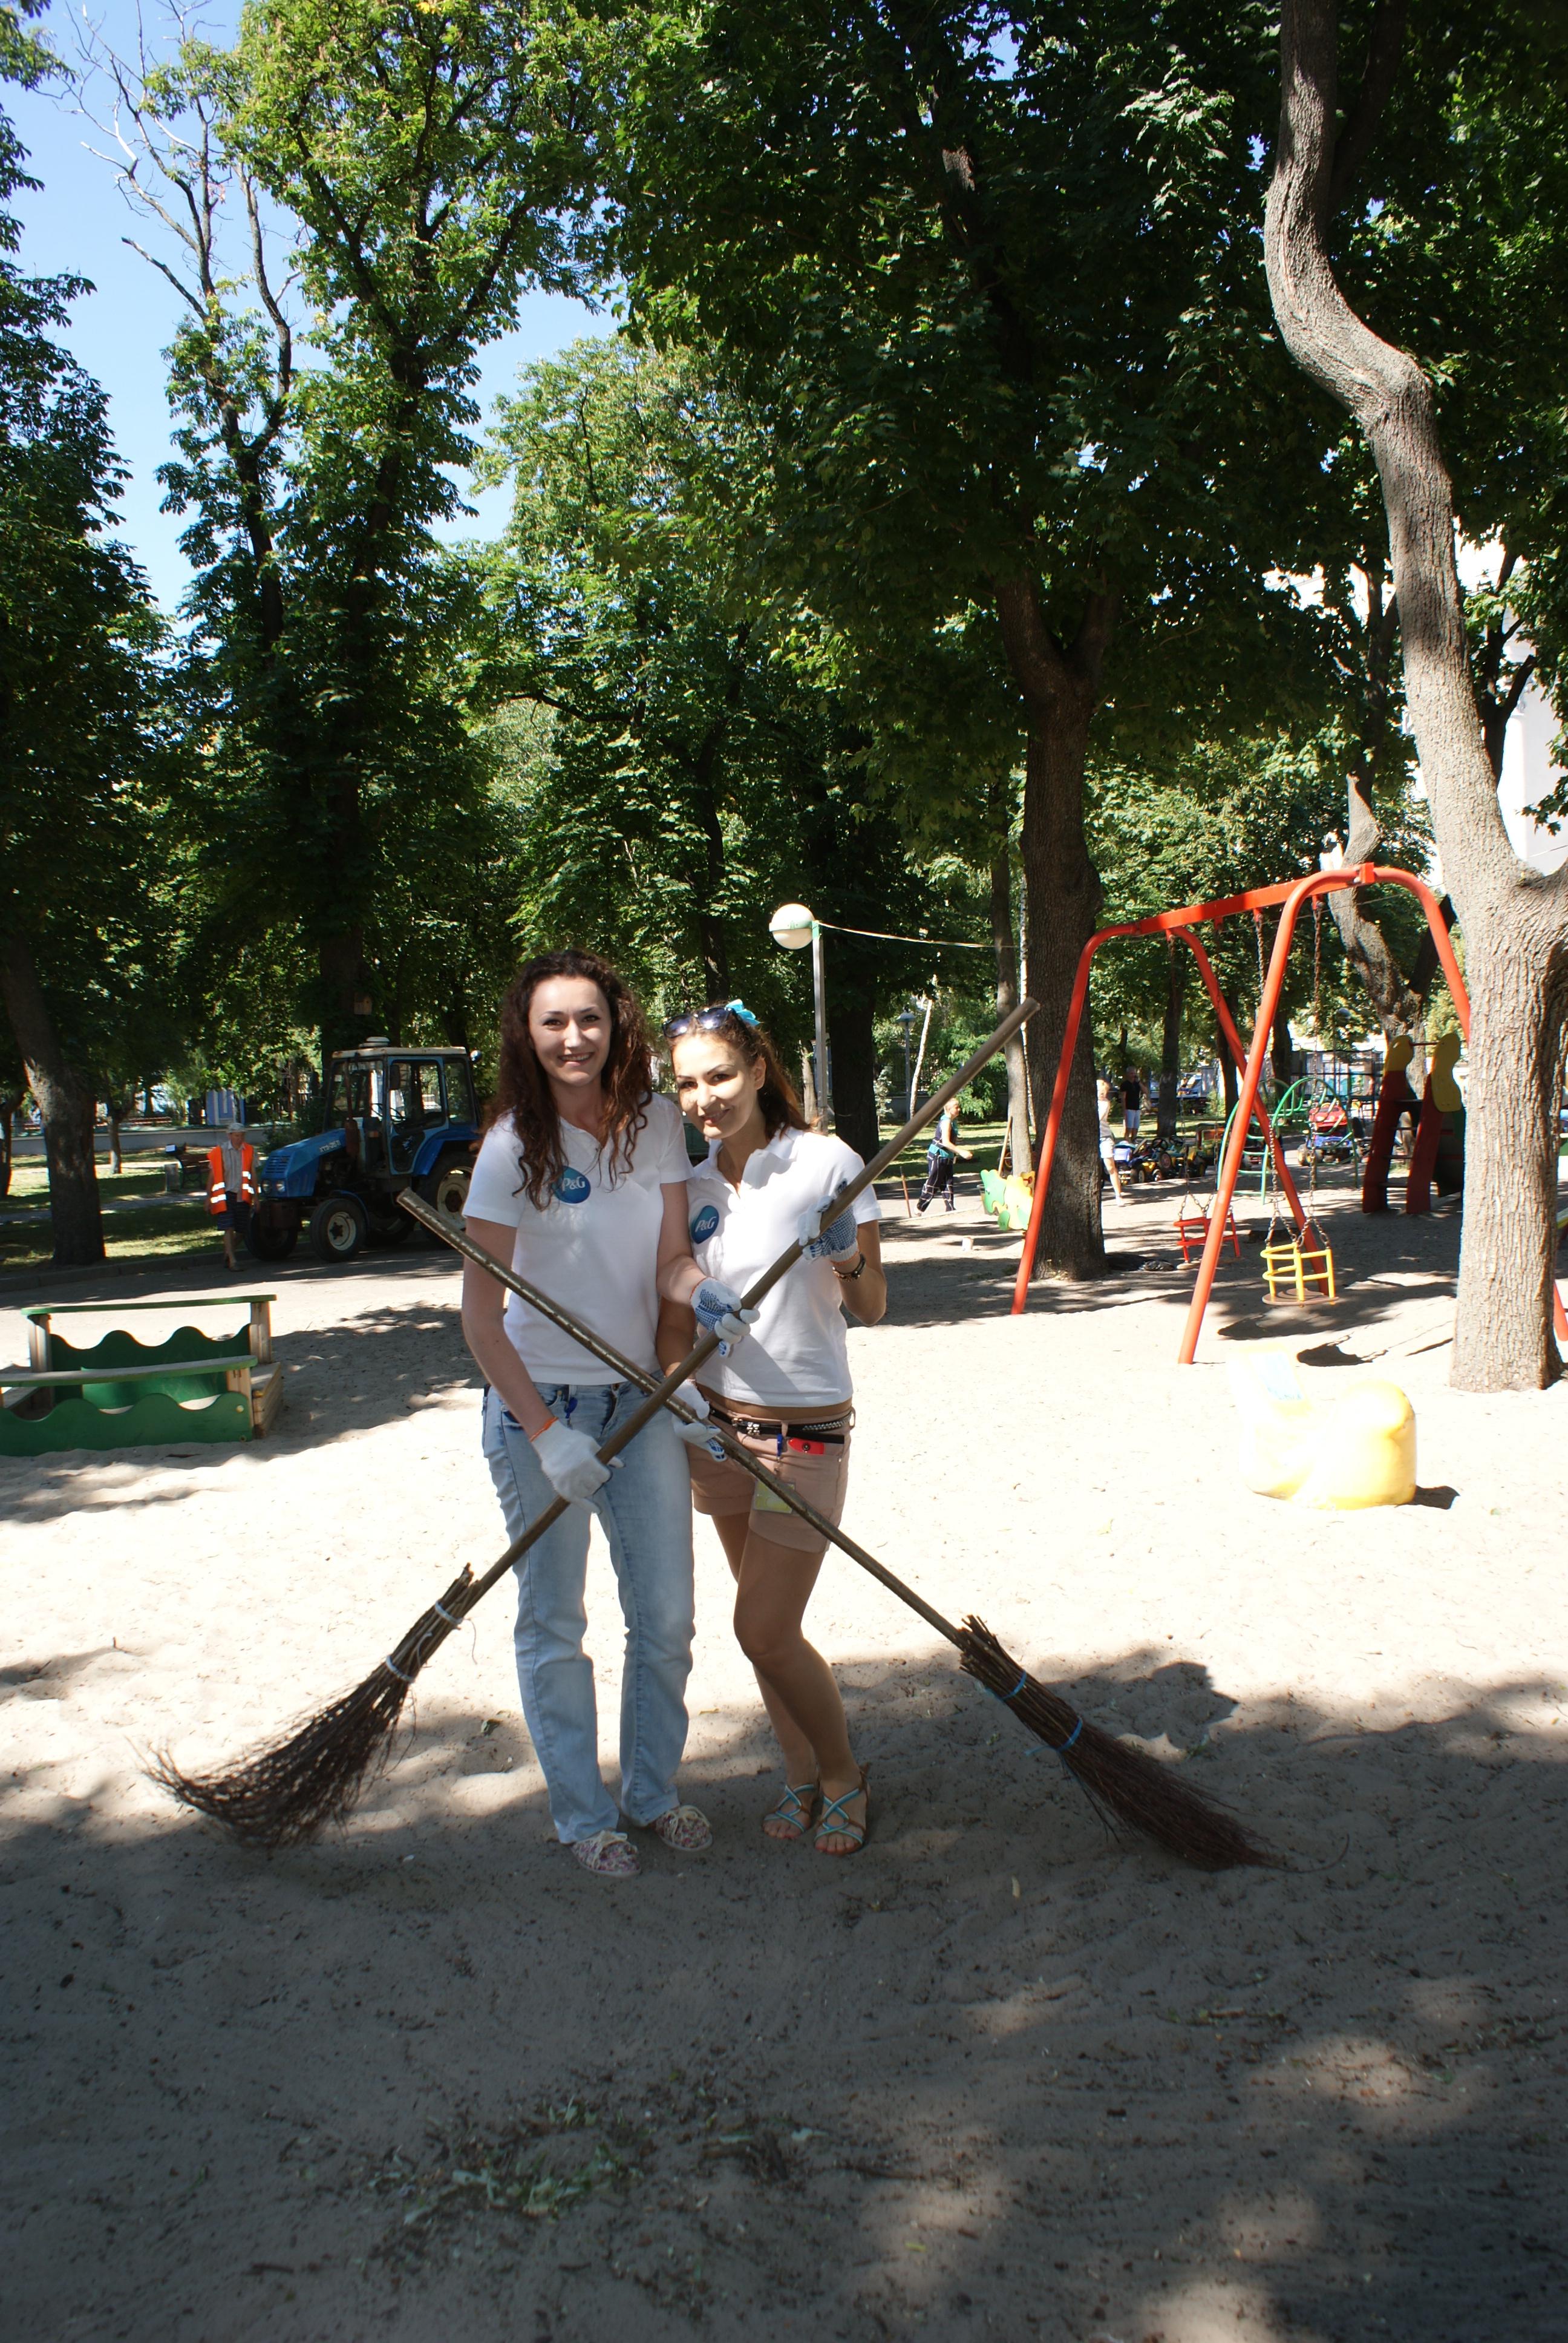 and P&G team renovating playground (18633563930).jpg SONY DSC Date 13 June 2015, 09:30 Source UNICEF Ukraine and P&G team renovating playground Author